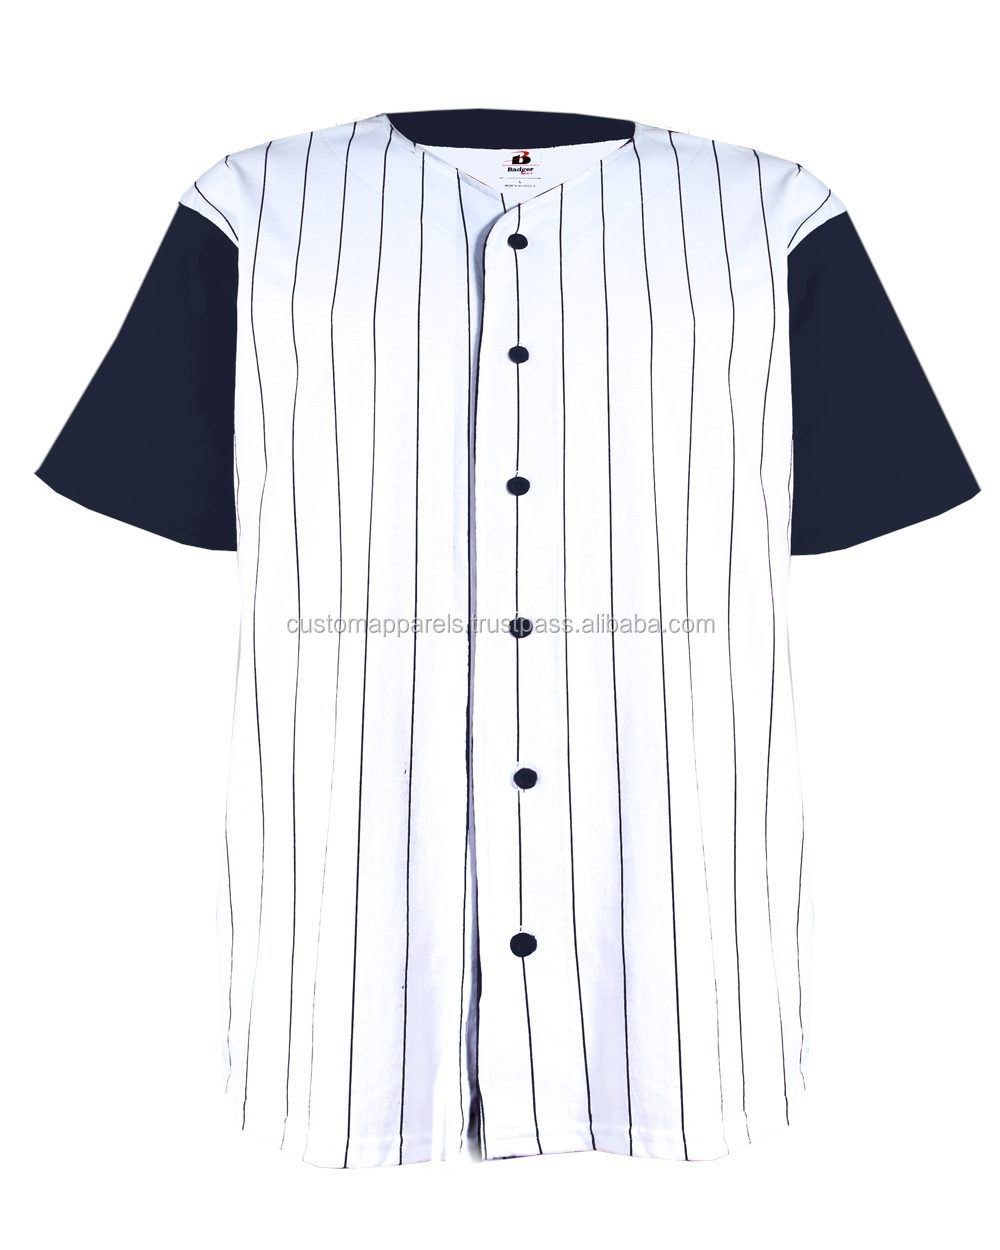 cheap blank baseball jerseys buy cheap baseball jersey